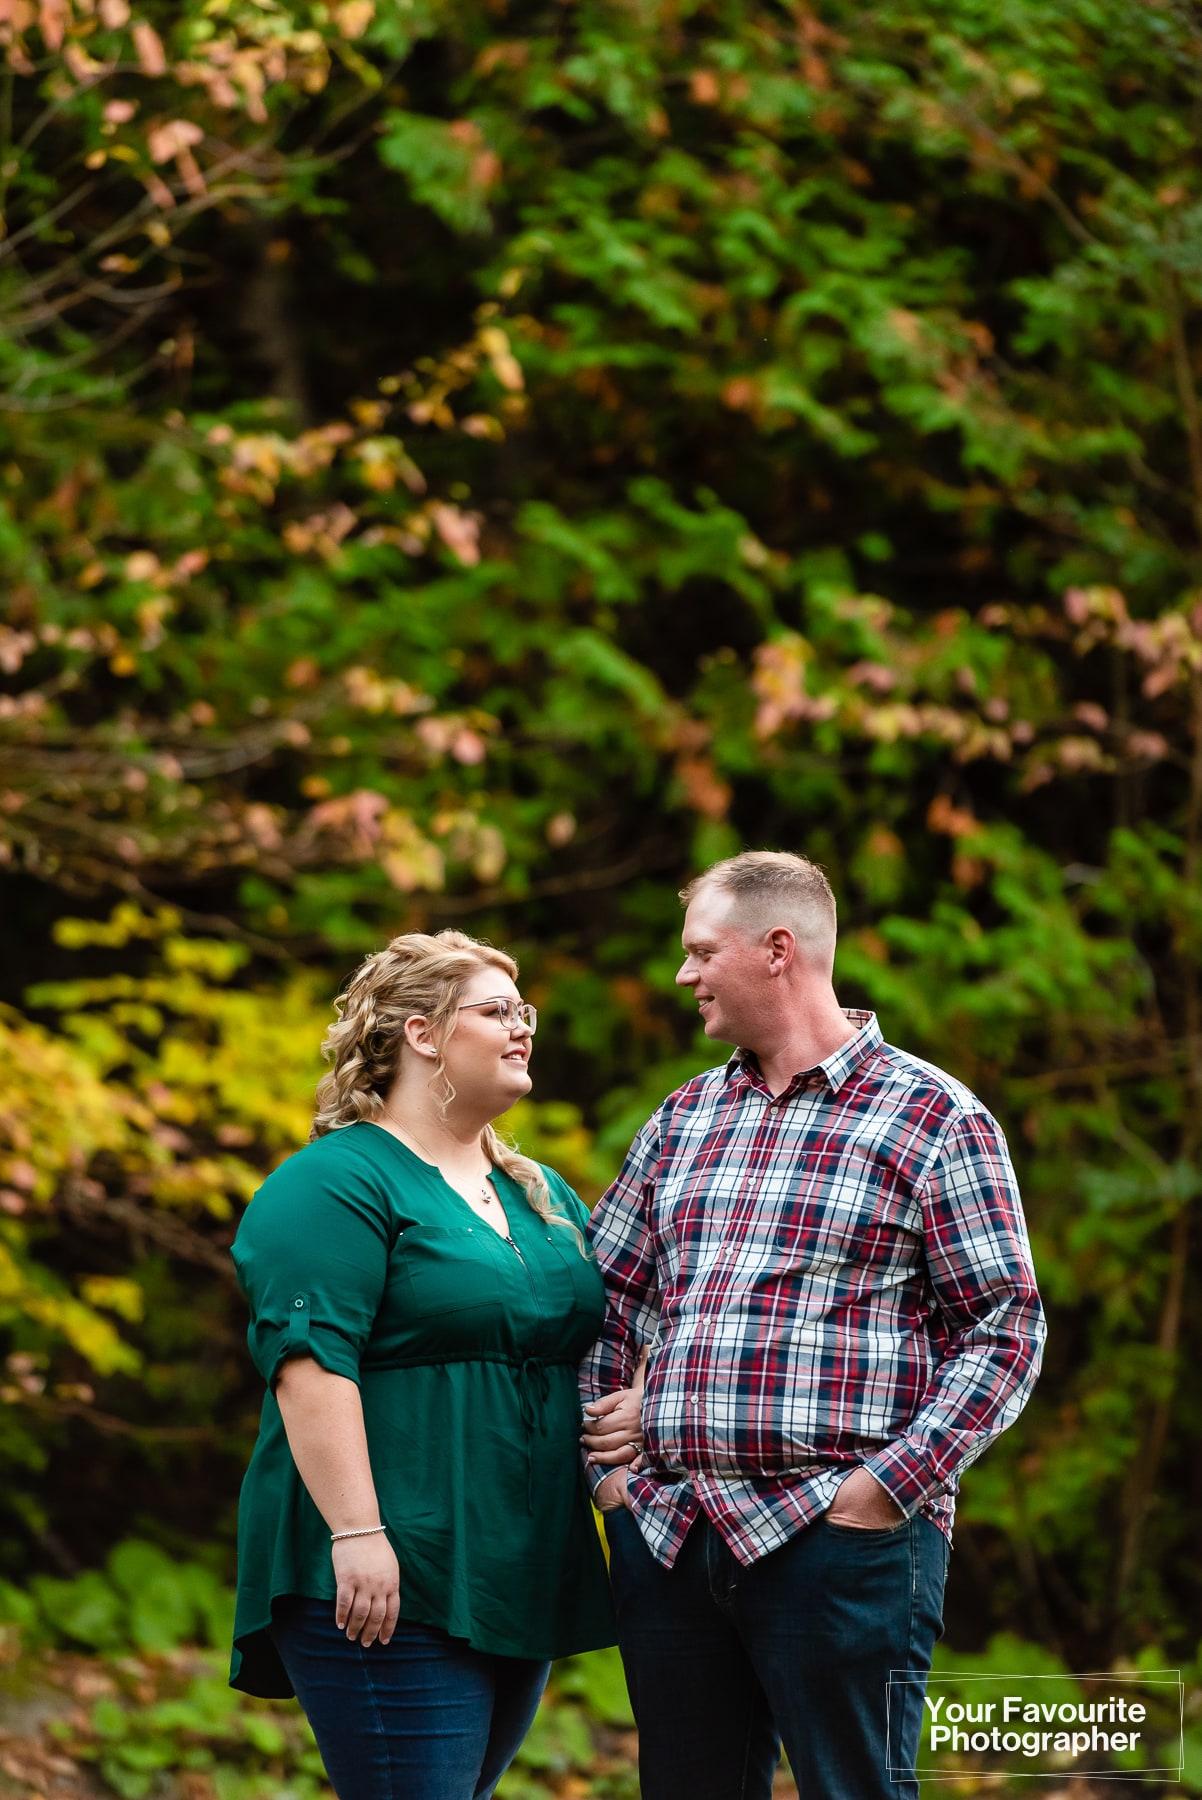 Engagement Photo Shoot at Enniskillen Conservation Area